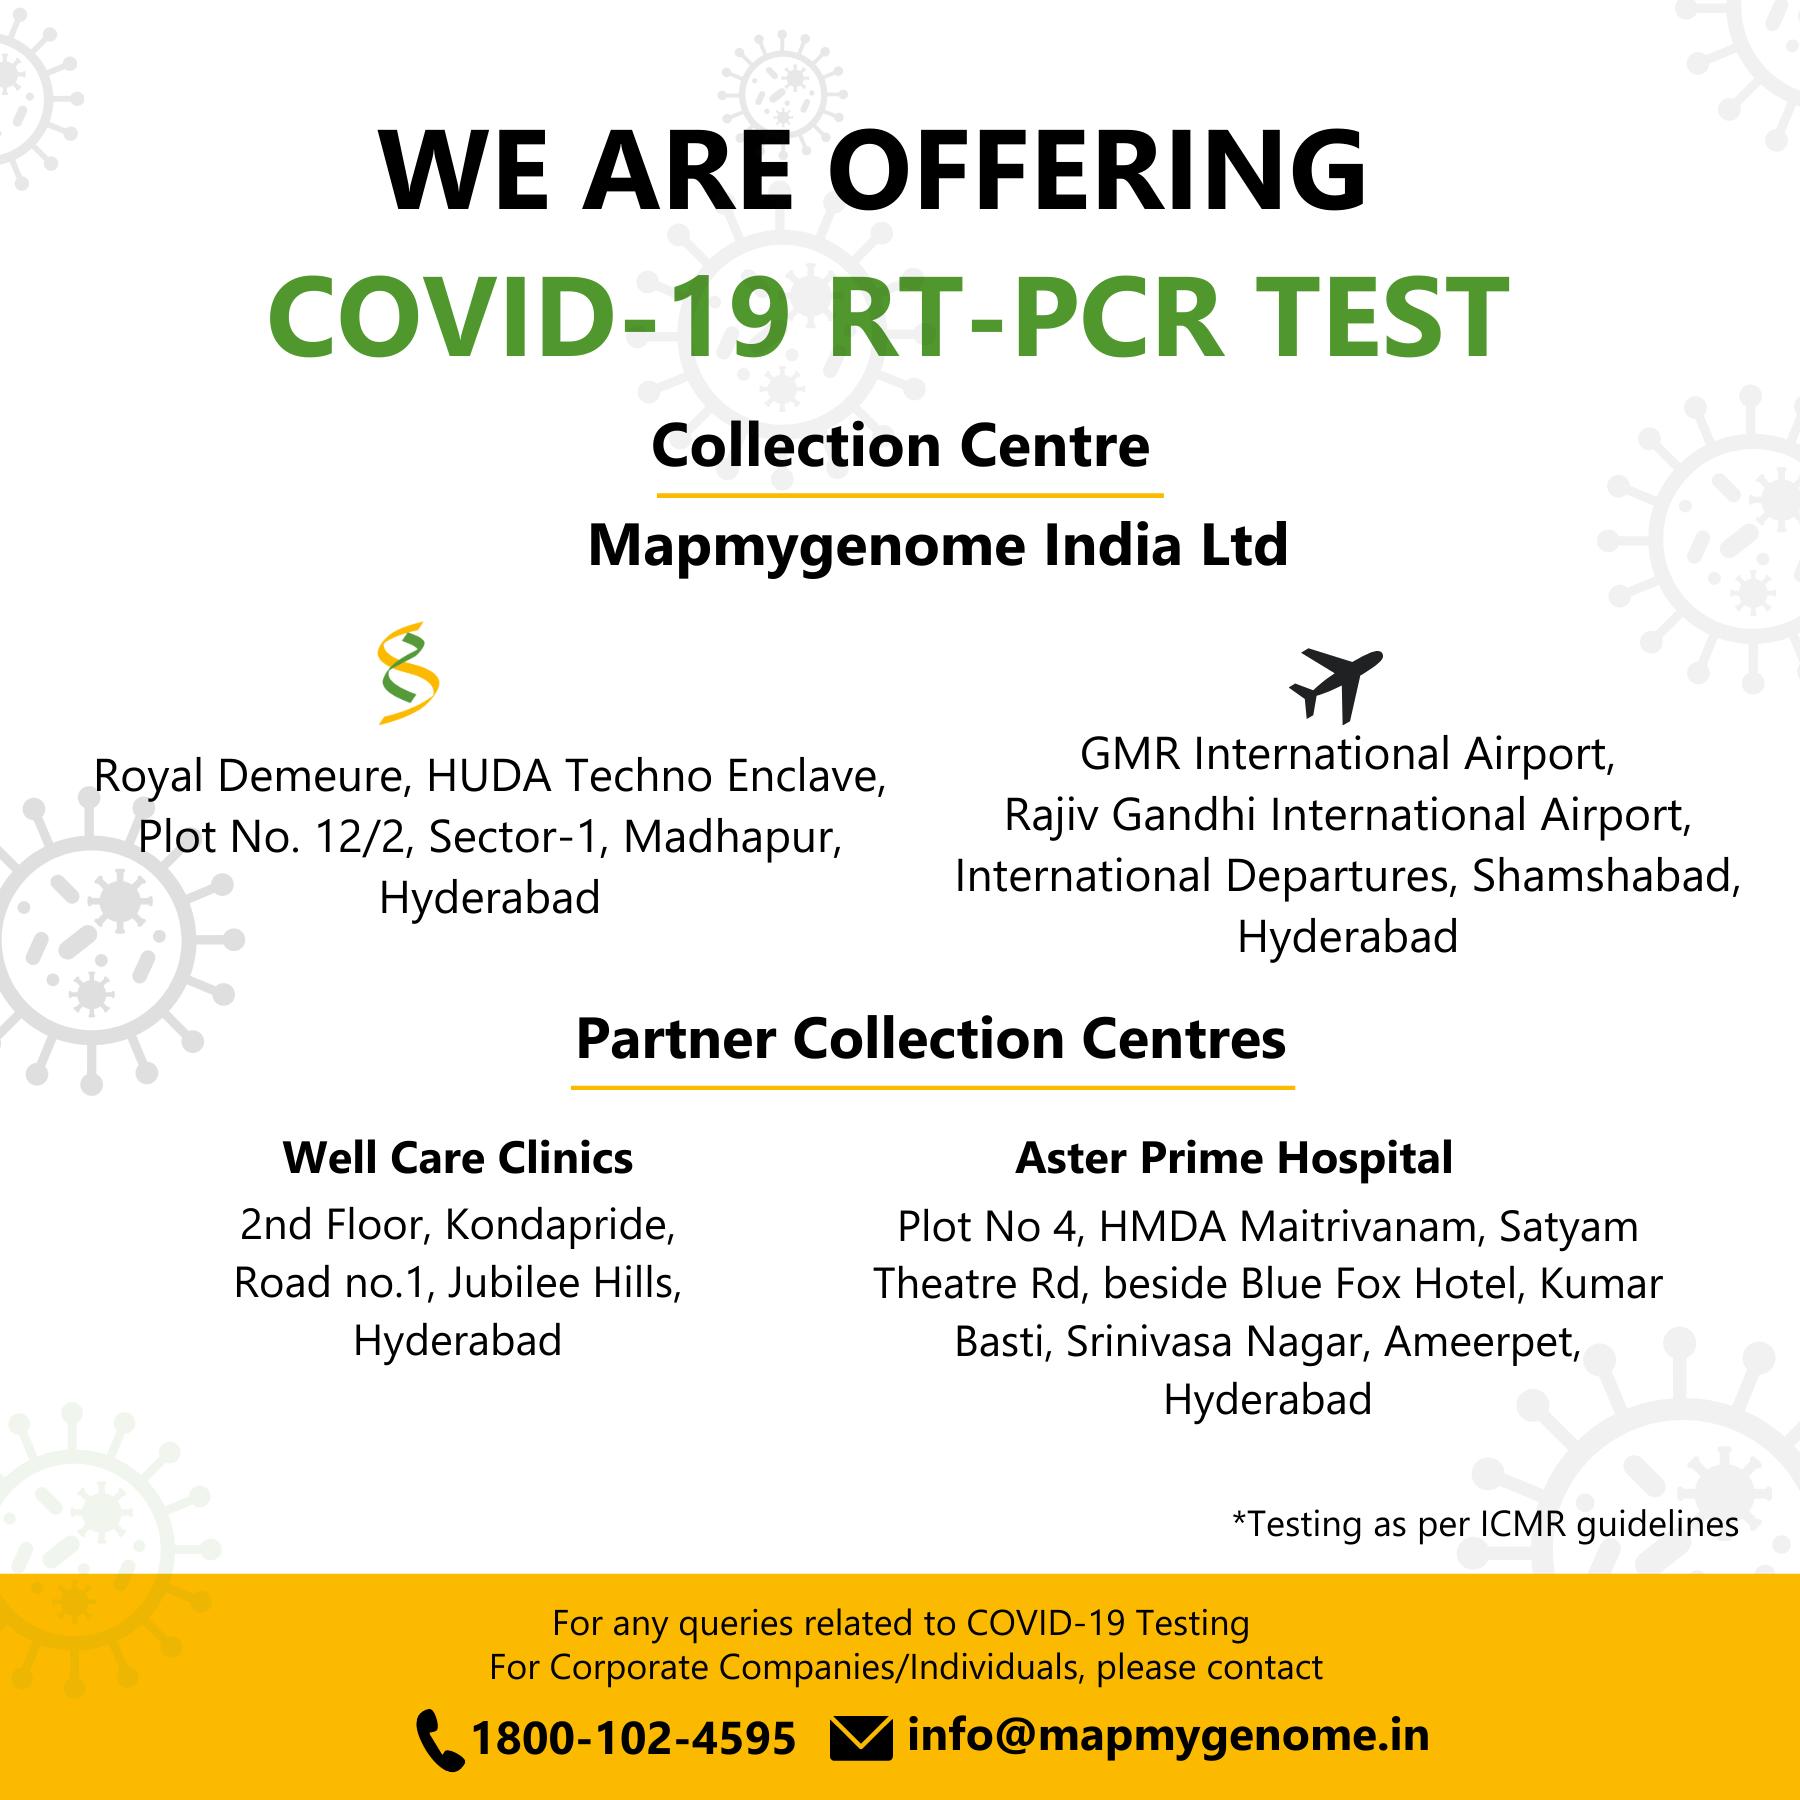 COVID-19 RT-PCR TEST